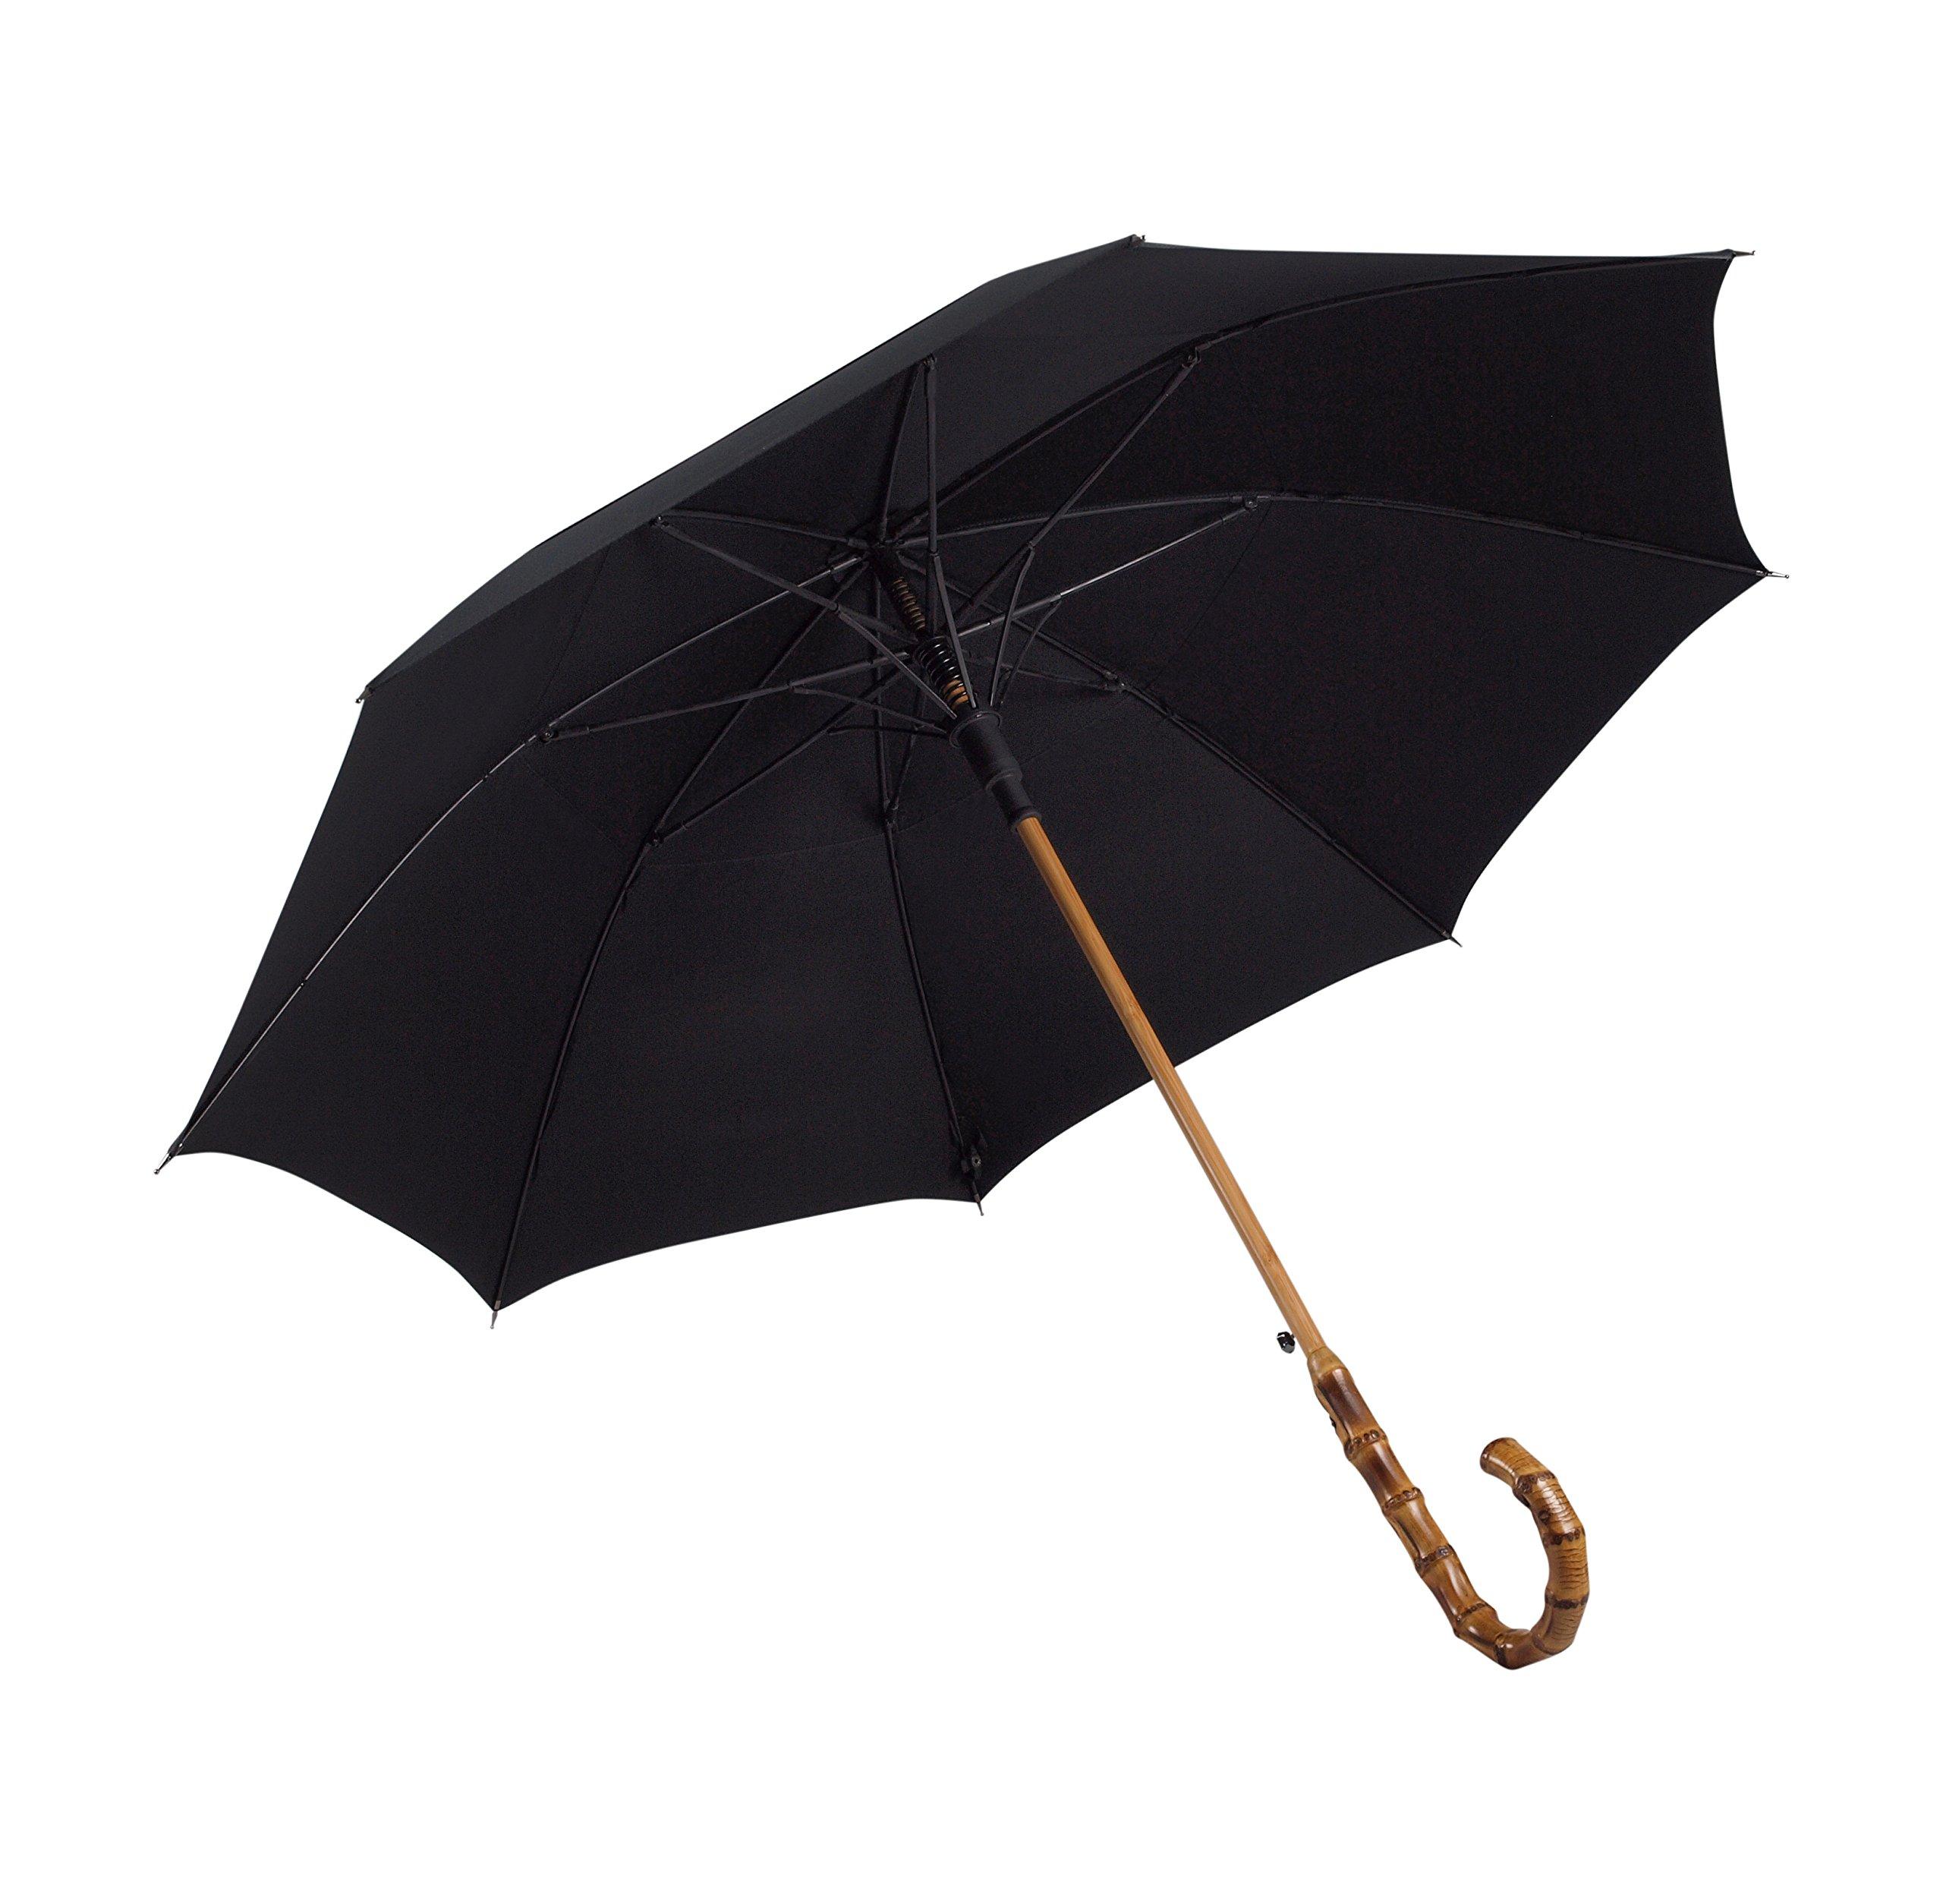 UK Designed-Balios Prestige Walking Stick Umbrella-Bamboo Handle-Double Canopy (Jet Black)